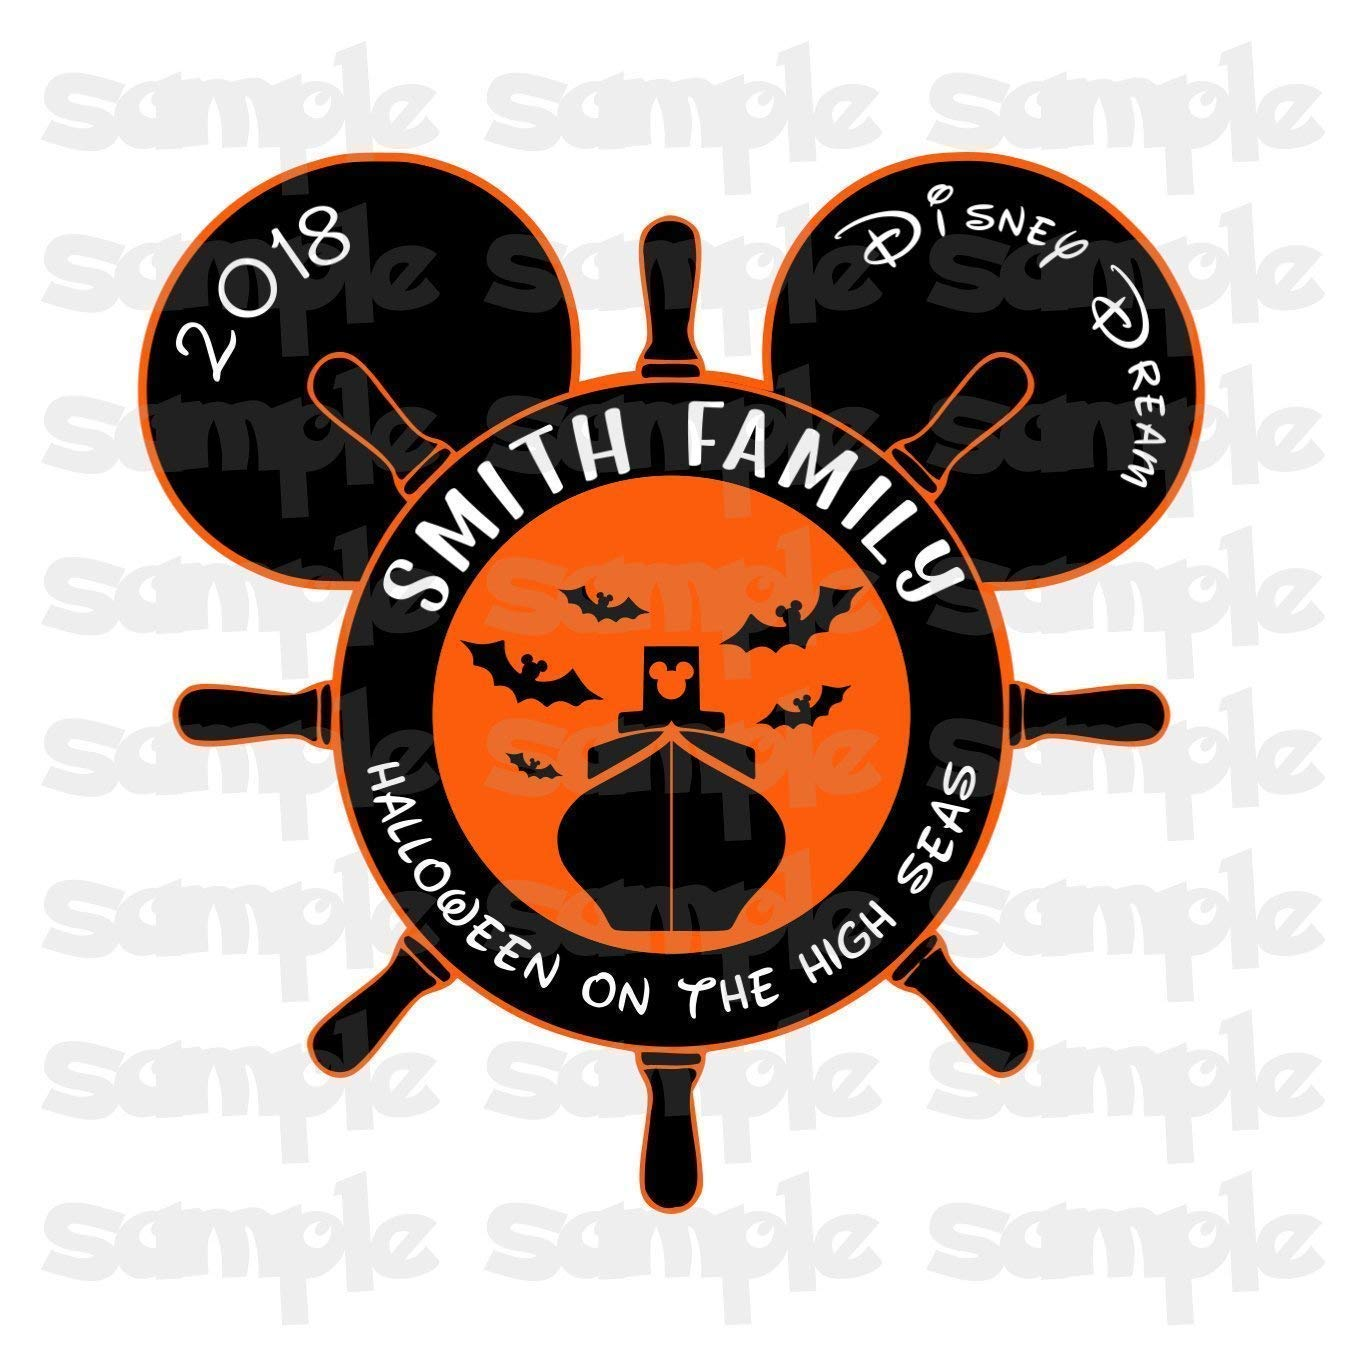 photo regarding Disney Cruise Door Decorations Printable known as Disney Halloween Magnet Halloween upon the Large Seas Halloween Disney Cruise Magnet Family members Magnet For Cruise Doorway